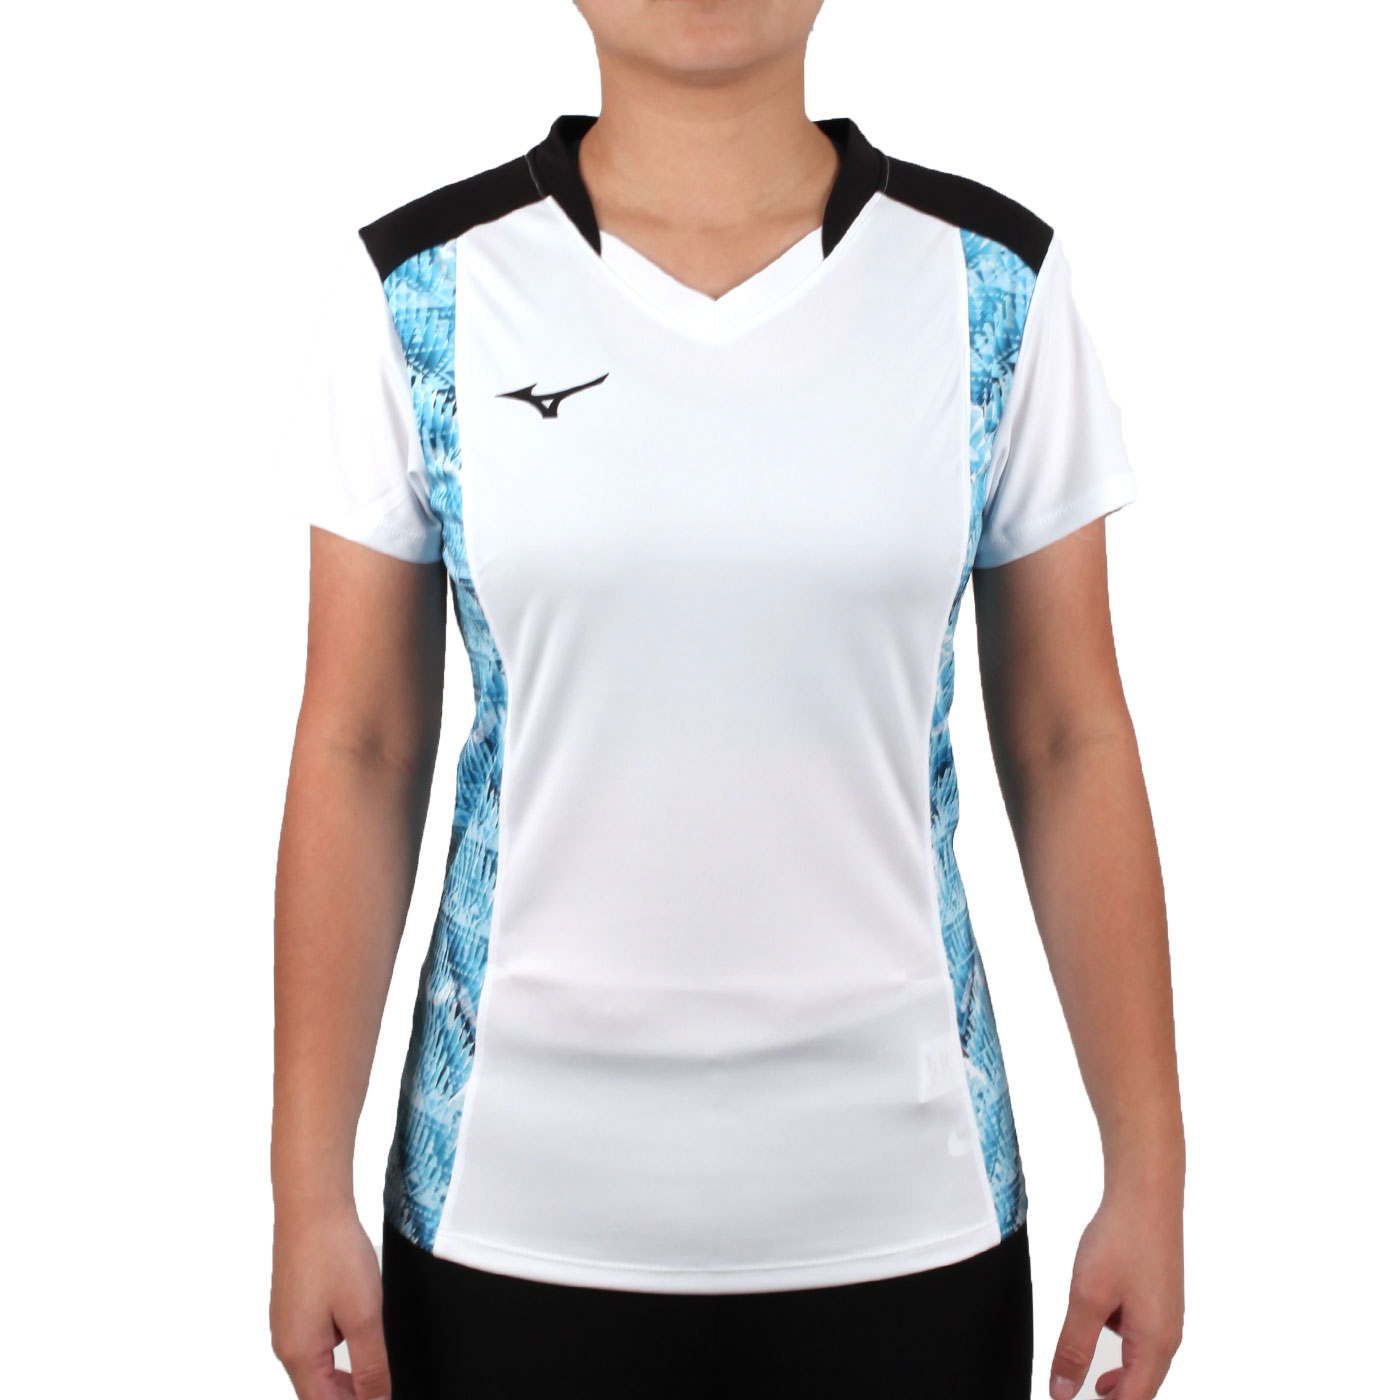 MIZUNO 女排球短袖上衣(2017企業排球聯賽) V2TA7C2901D - 白黑藍